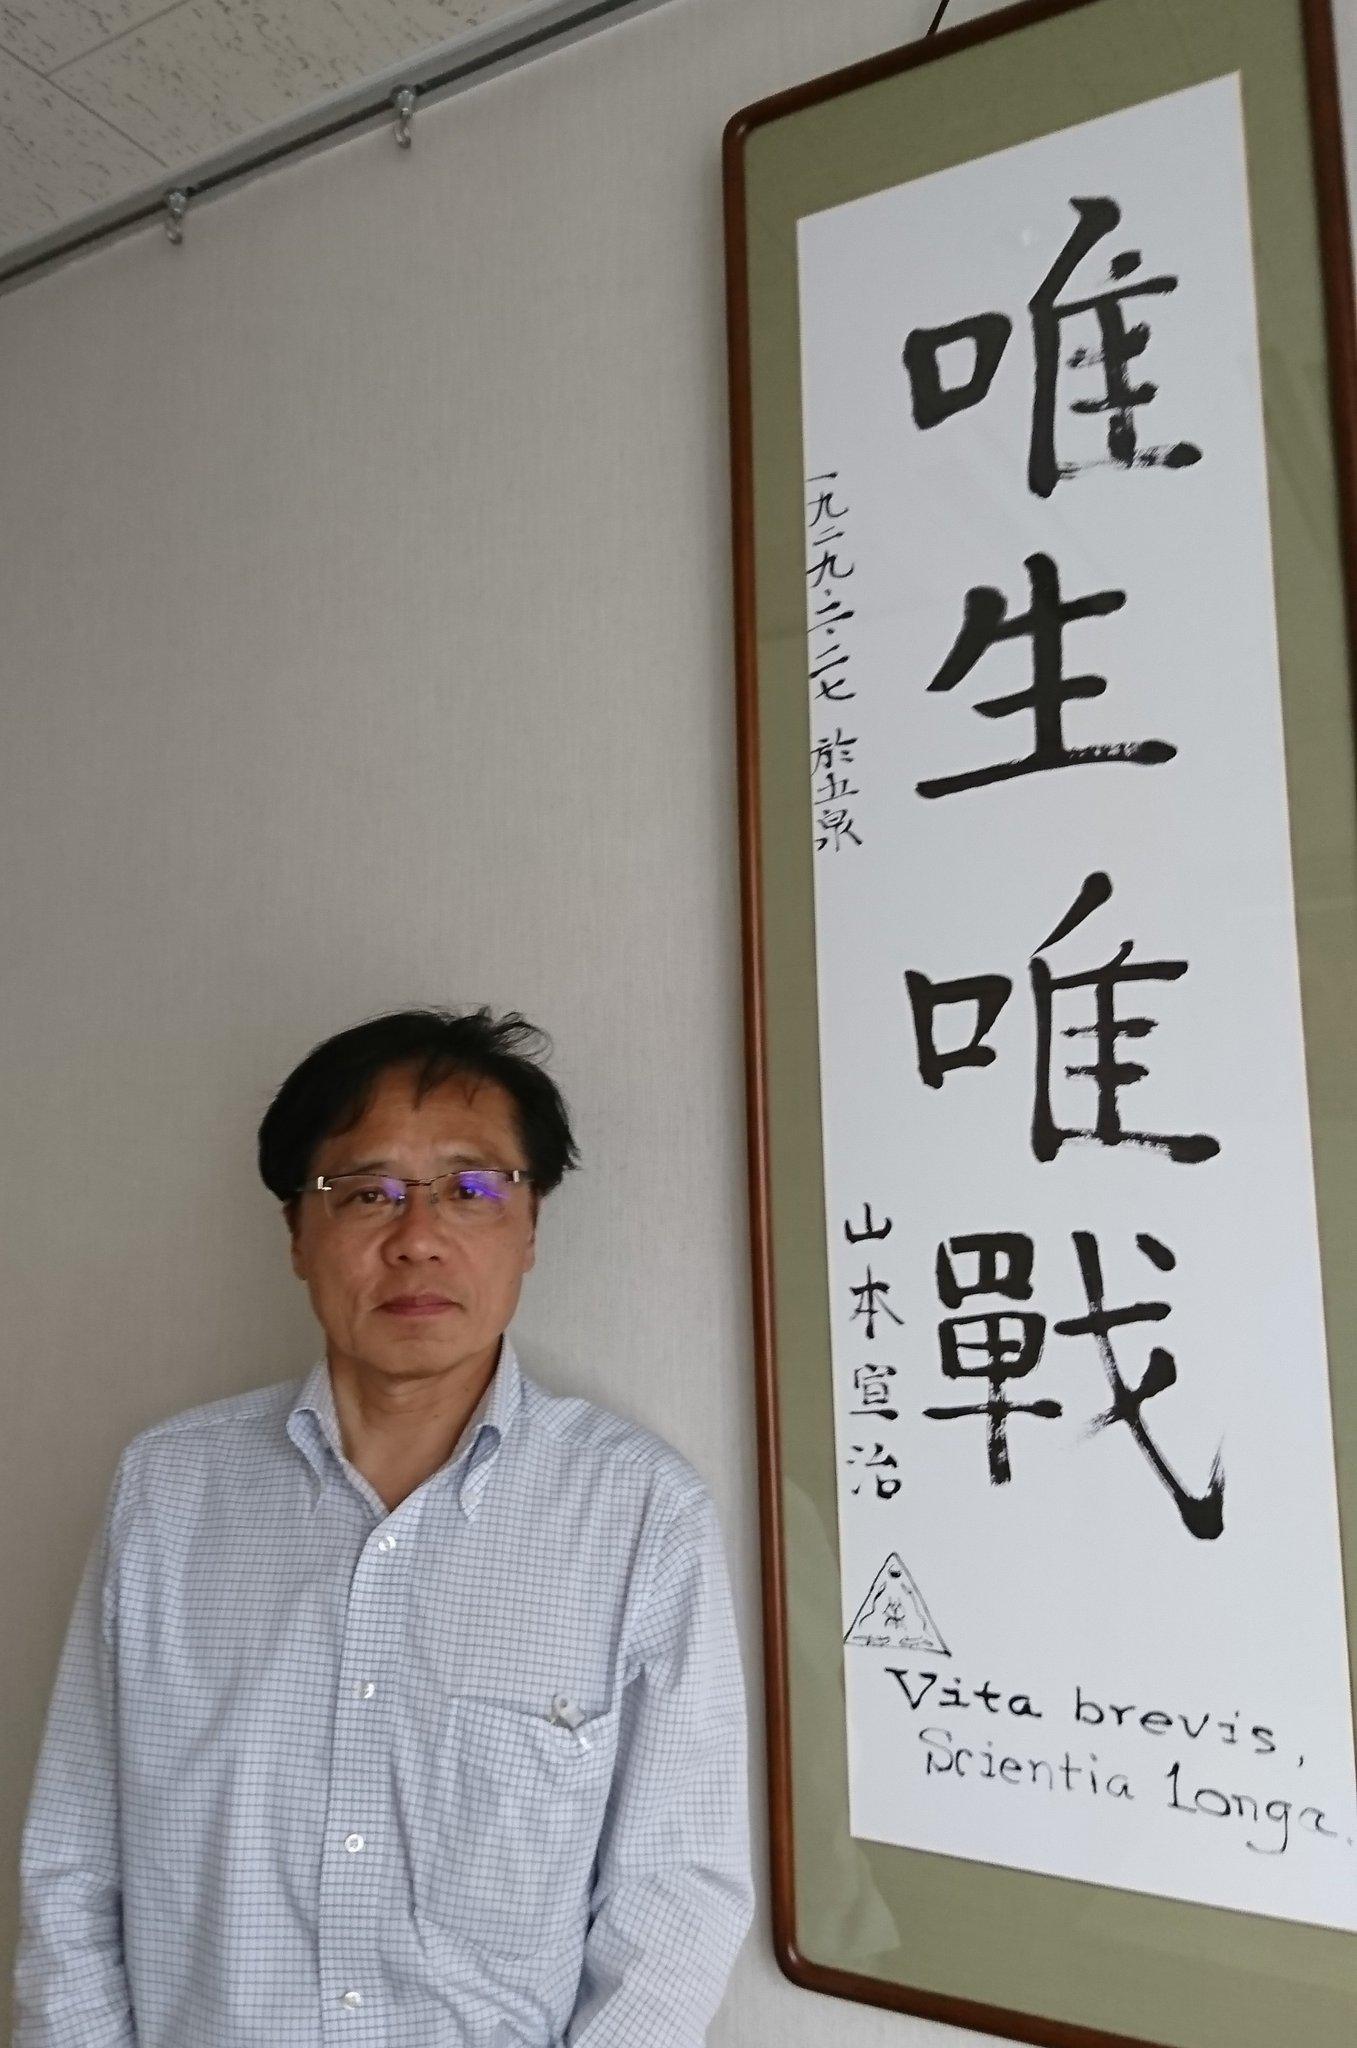 http://www.inoue-satoshi.com/diary/D_K9ffUUwAASdy_.jpg